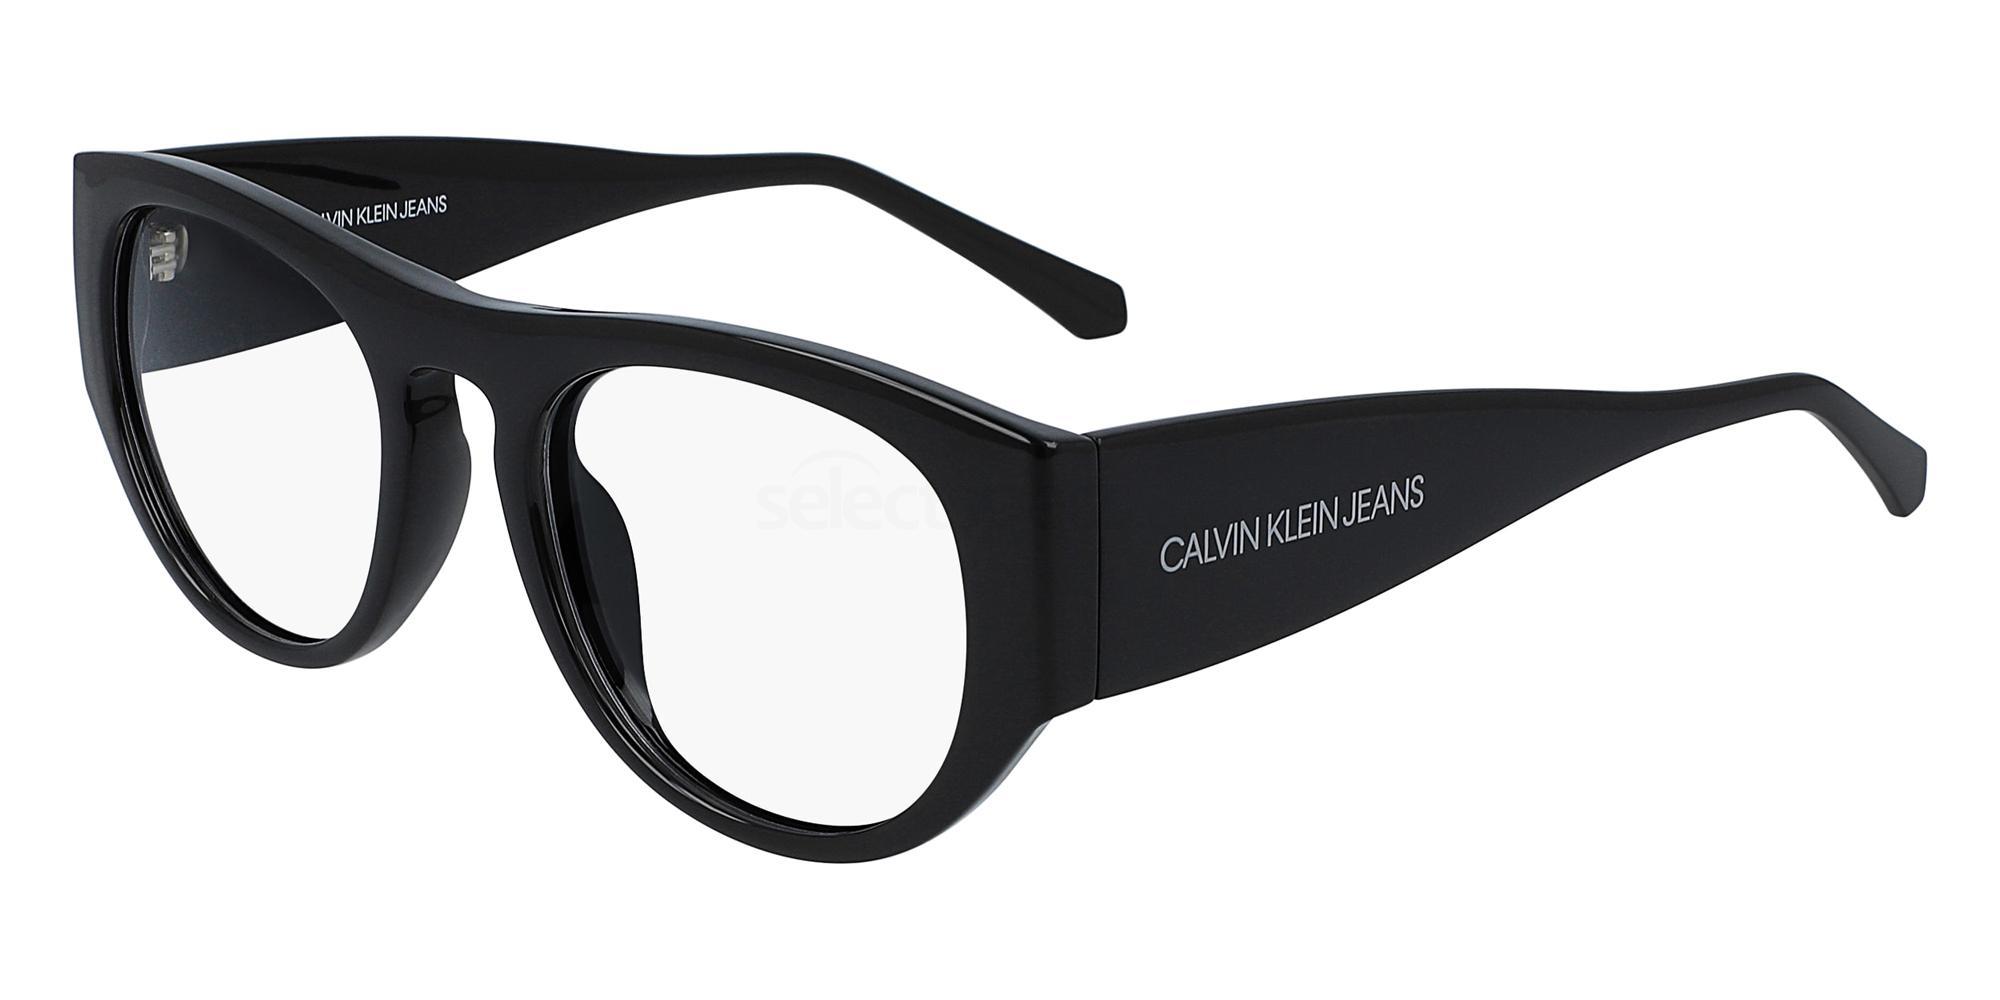 001 CKJ19510 Glasses, Calvin Klein Jeans